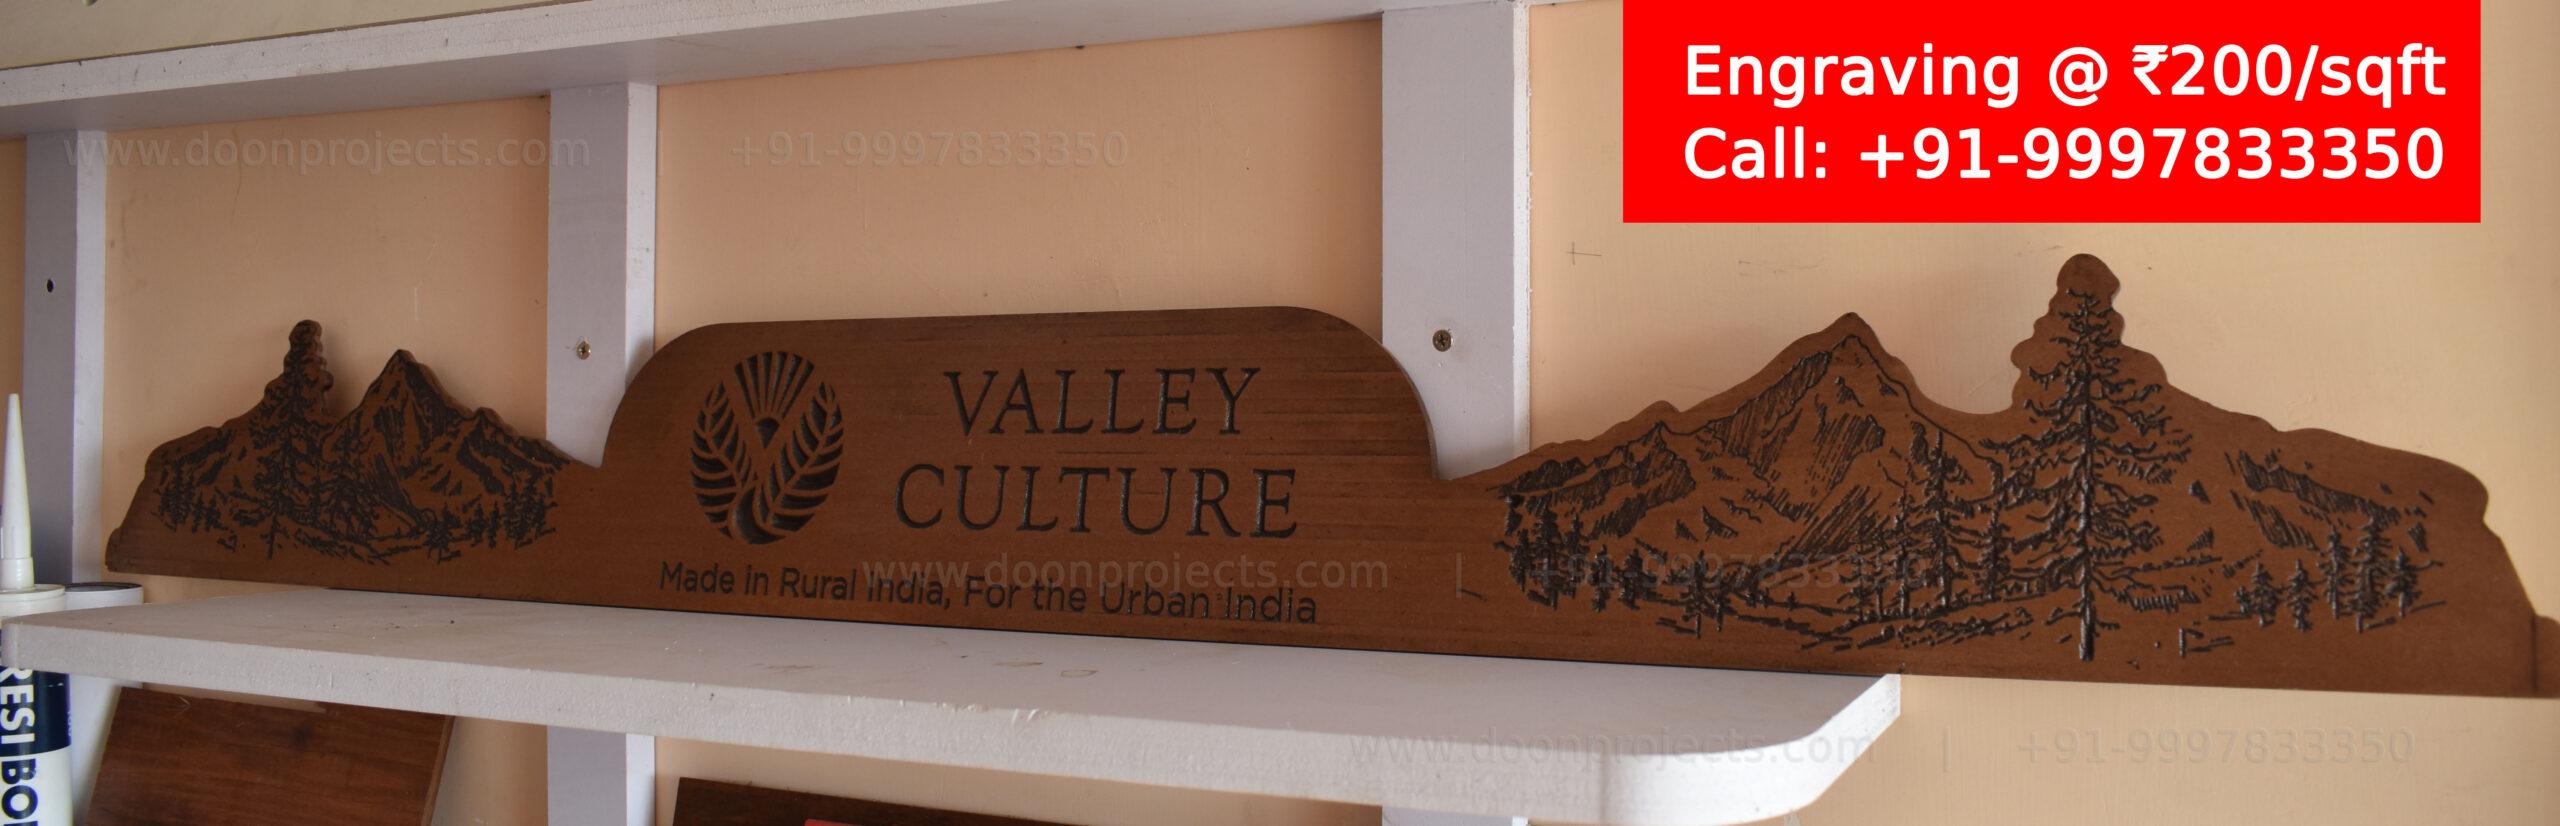 Engraved Shelf Branding in Dehradun